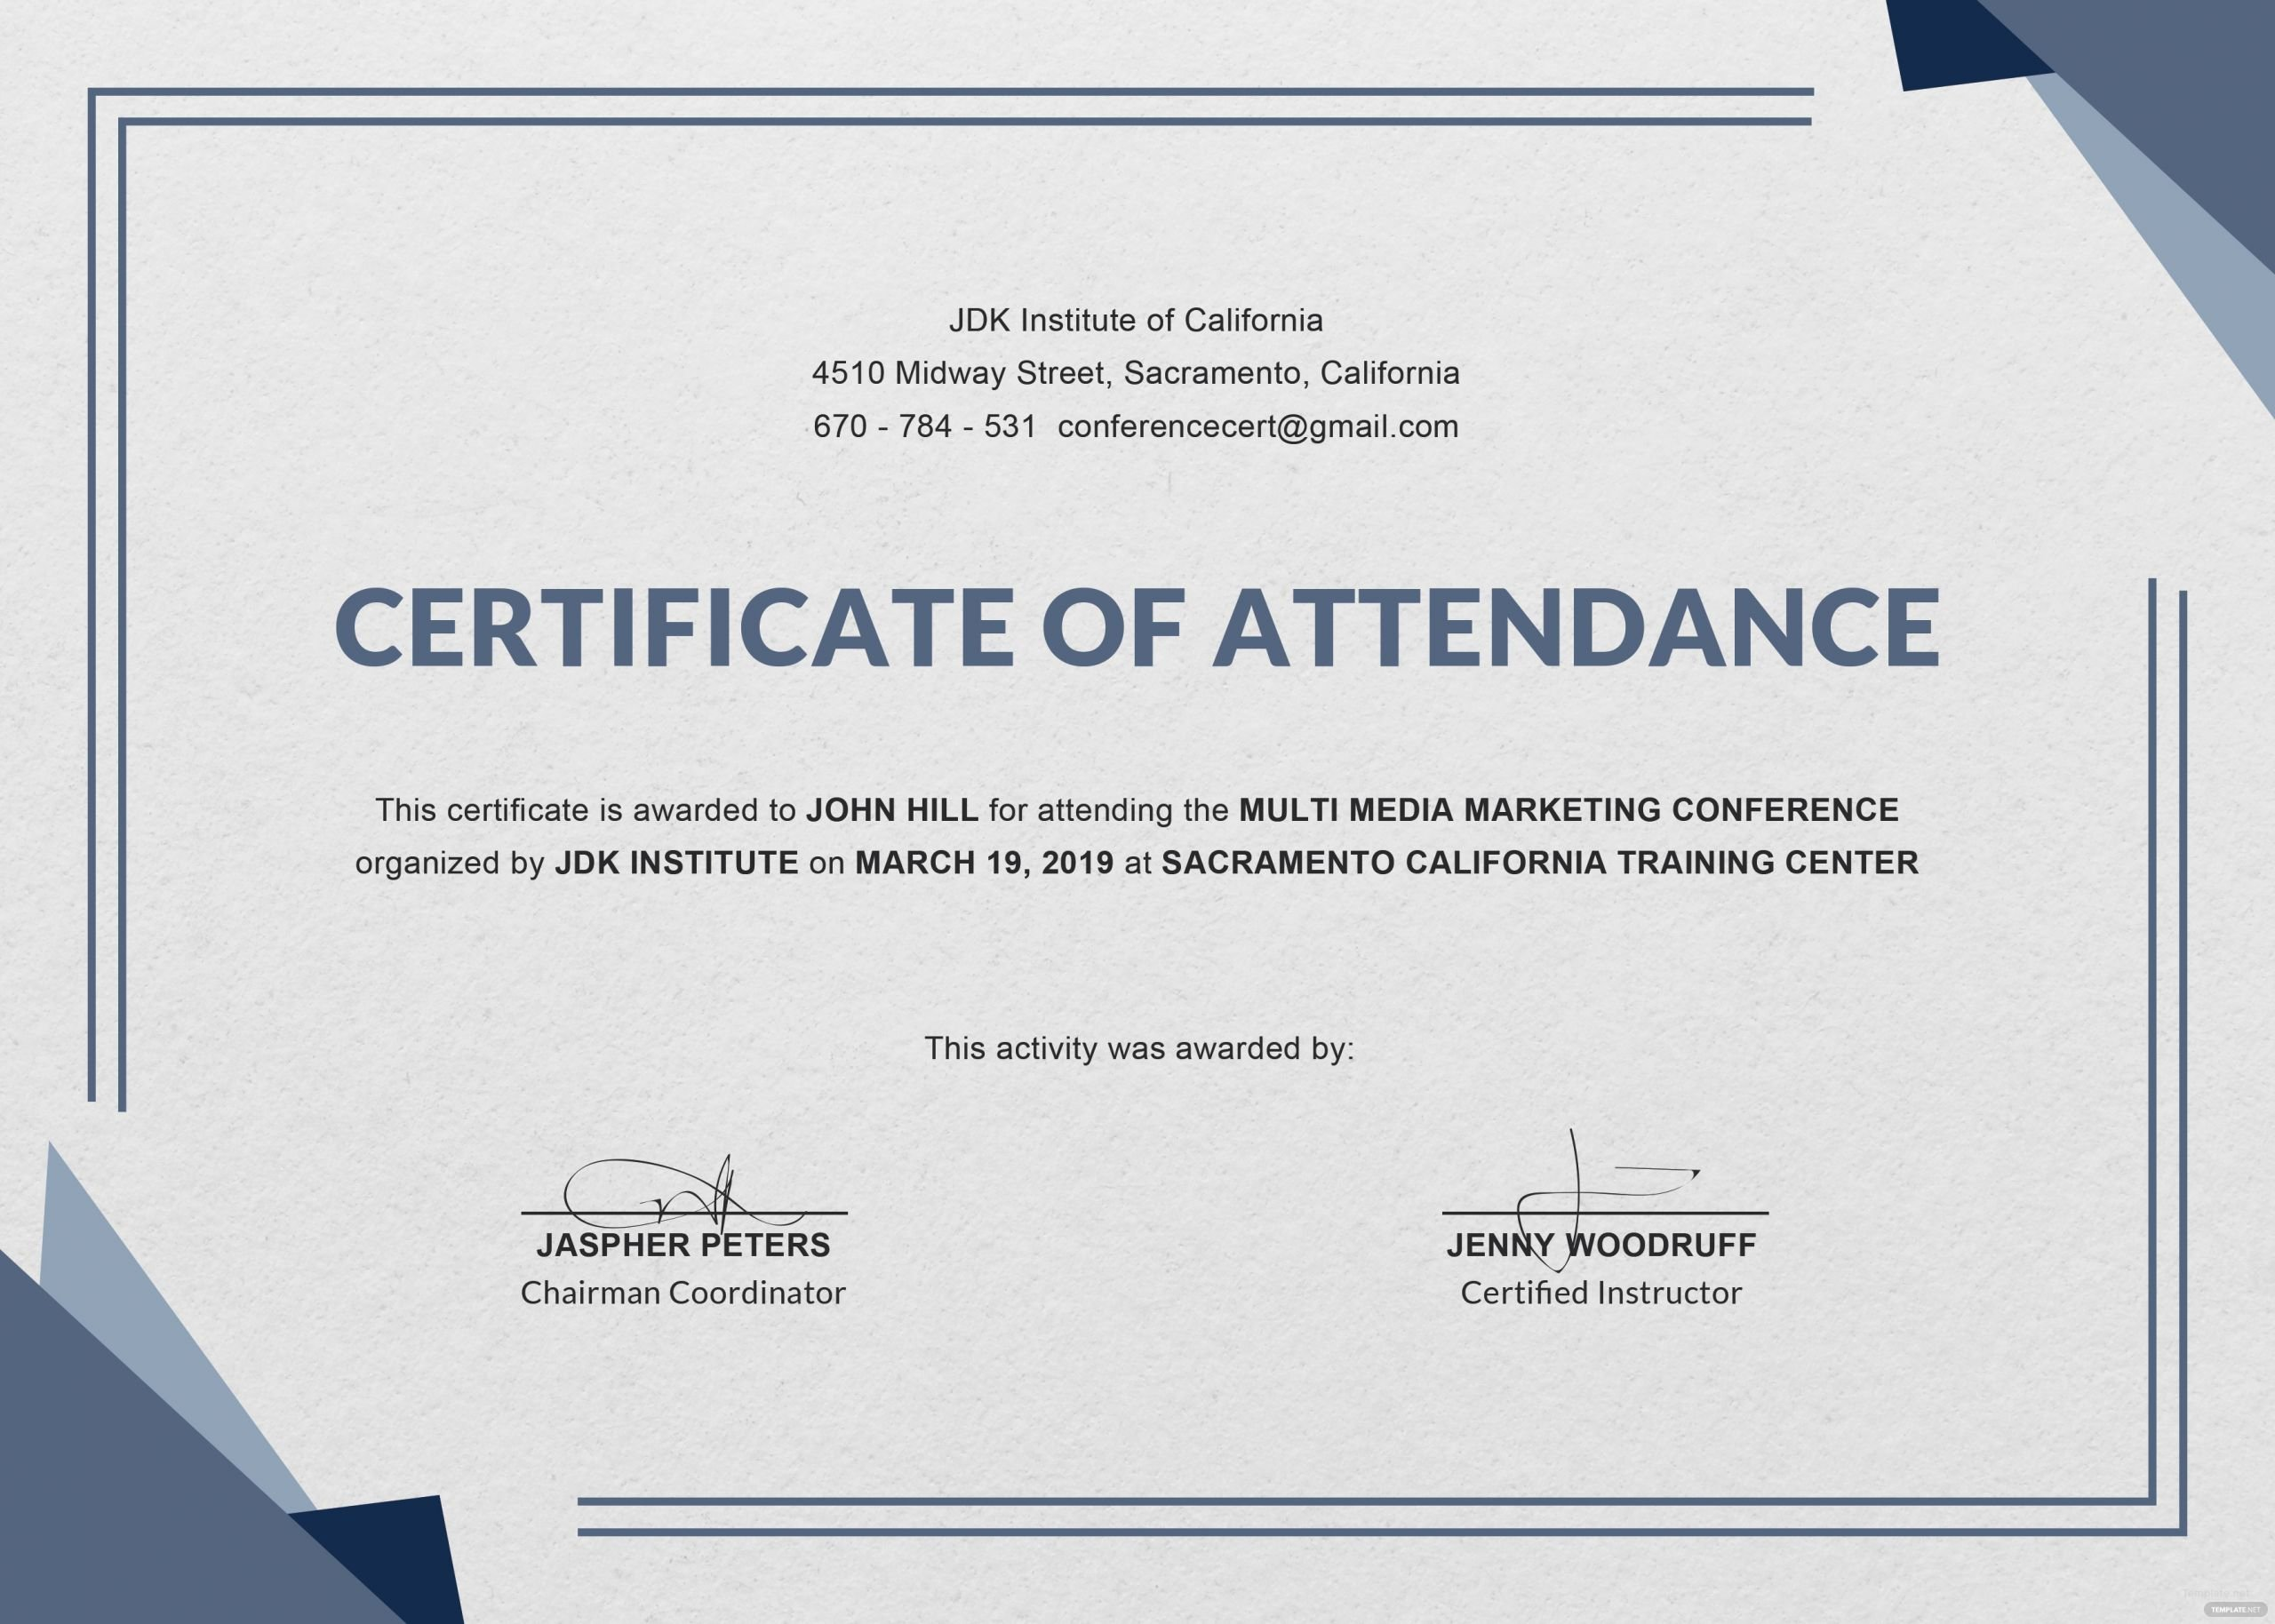 Perfect attendance Certificate Editable Awesome Certificate Templates Ms Word Perfect attendance